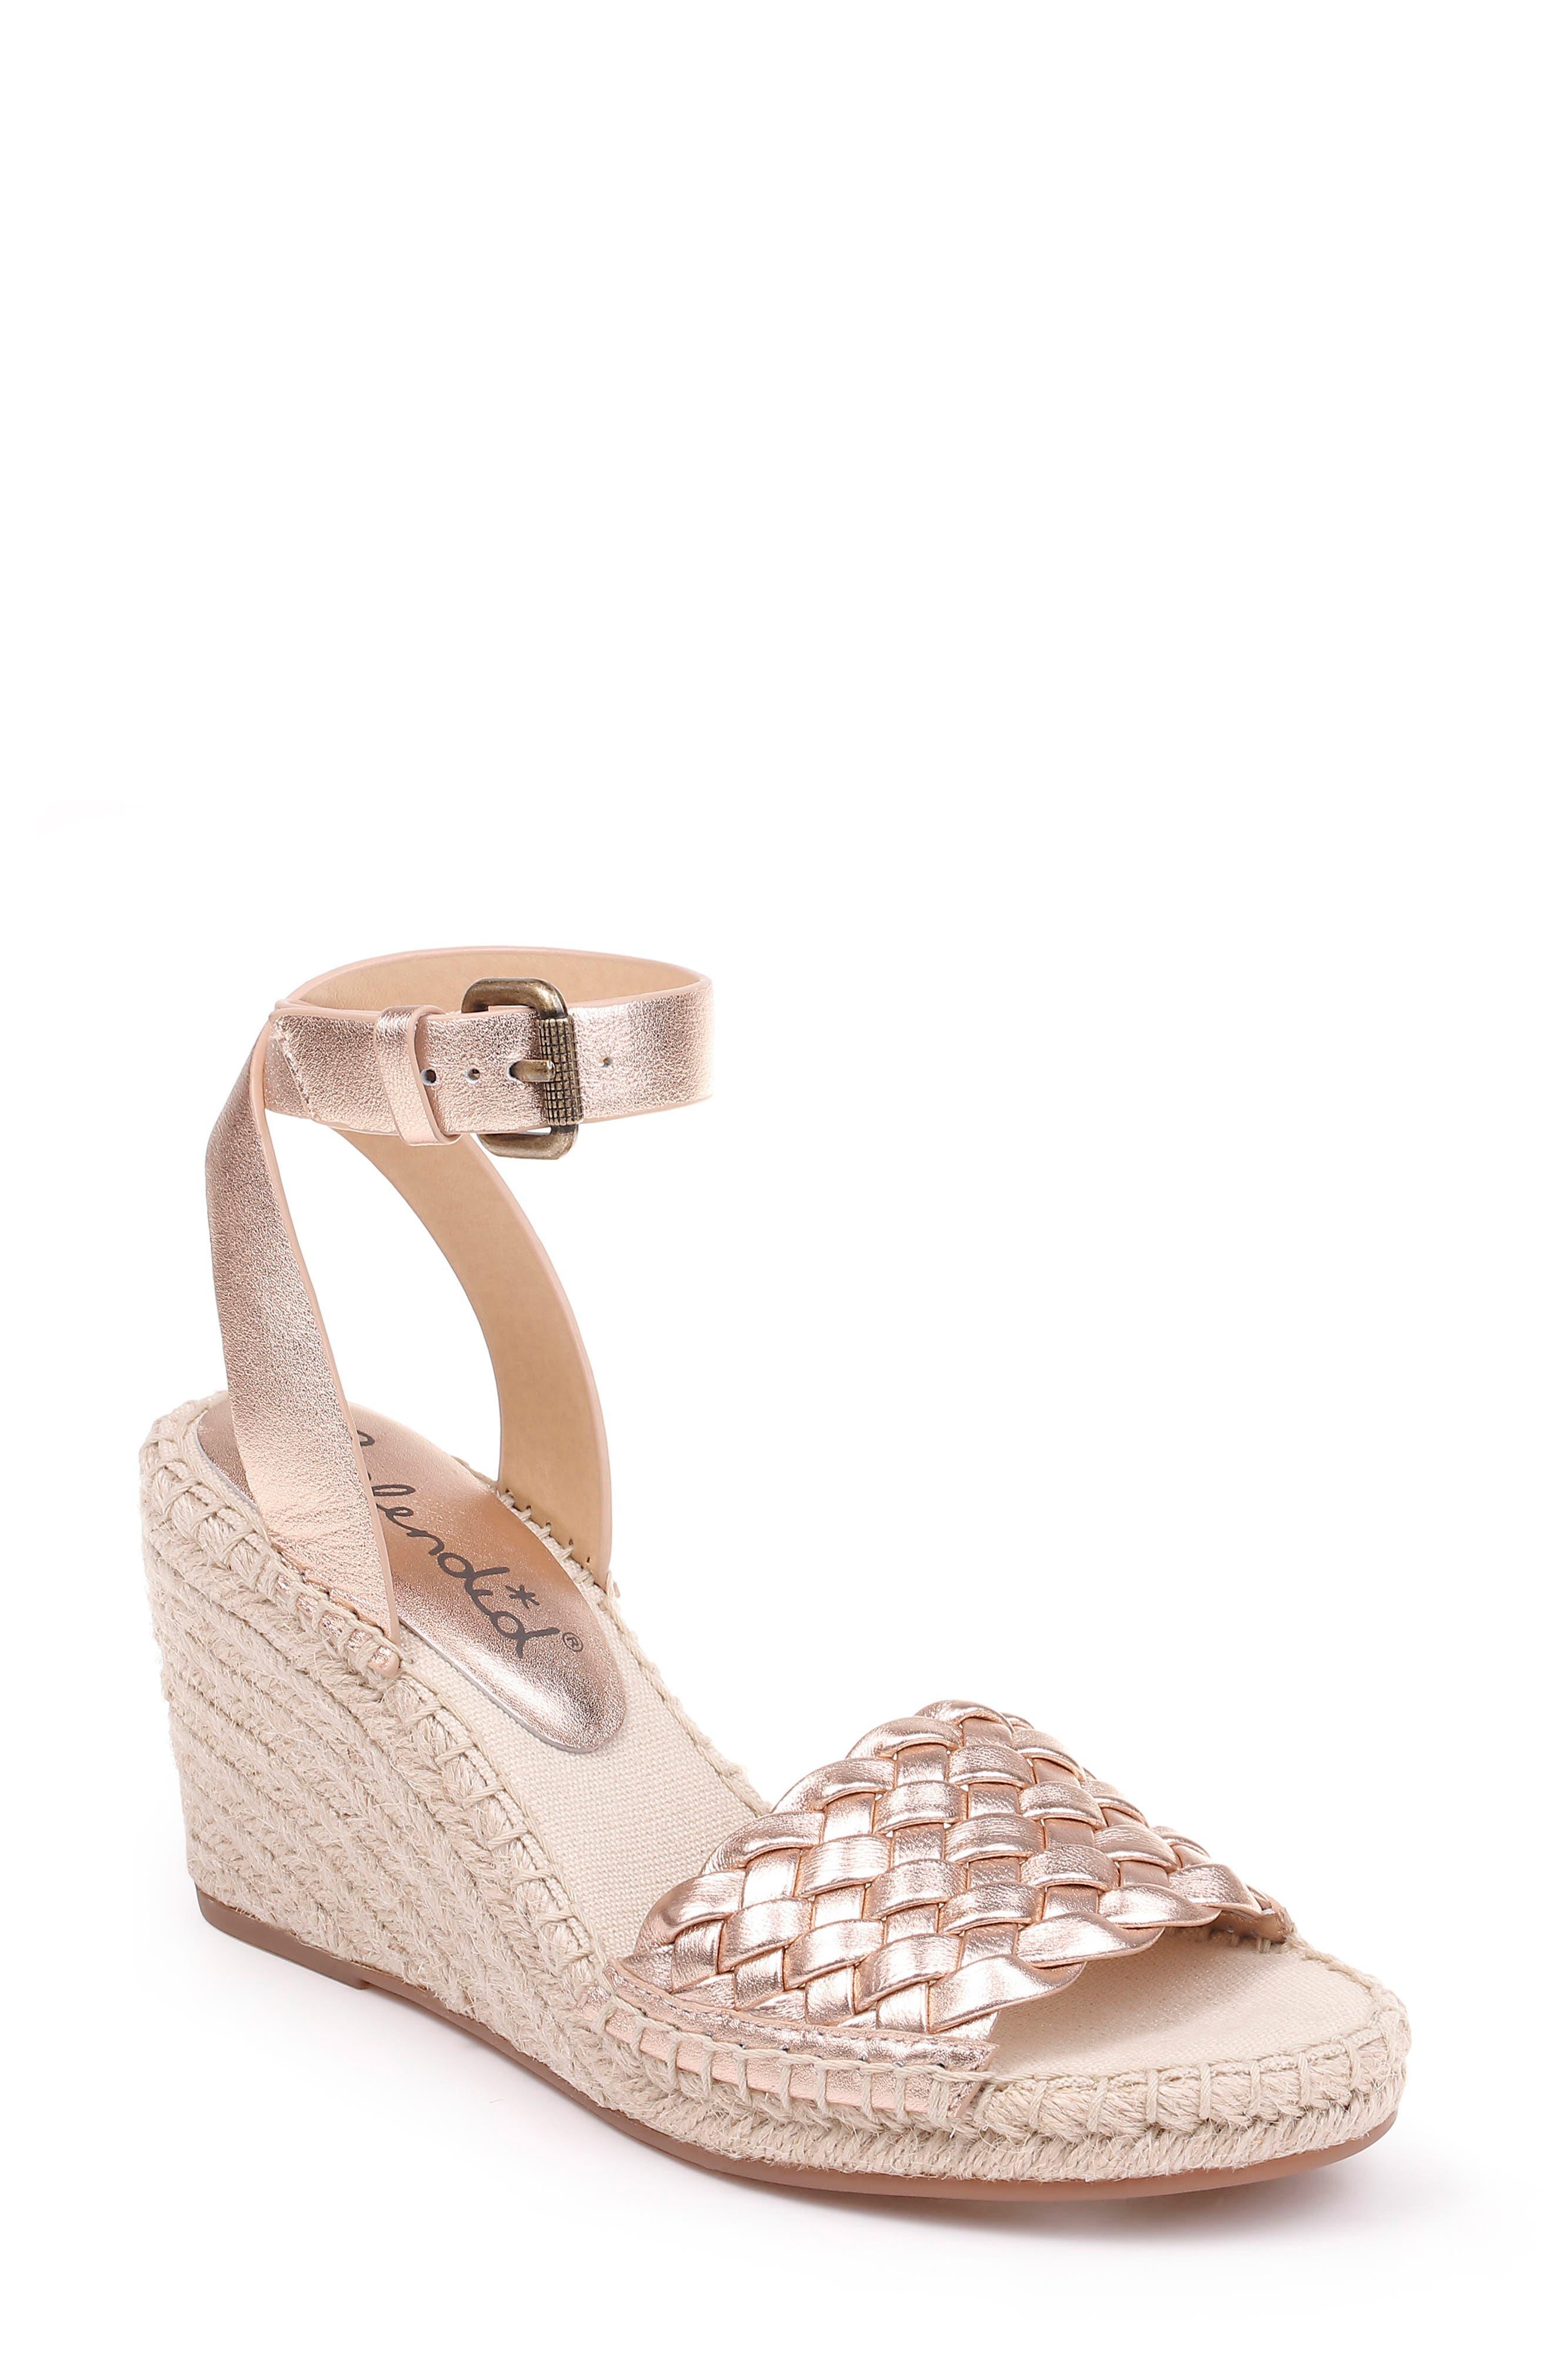 Splendid Tasman Woven Espadrille Sandal- Pink